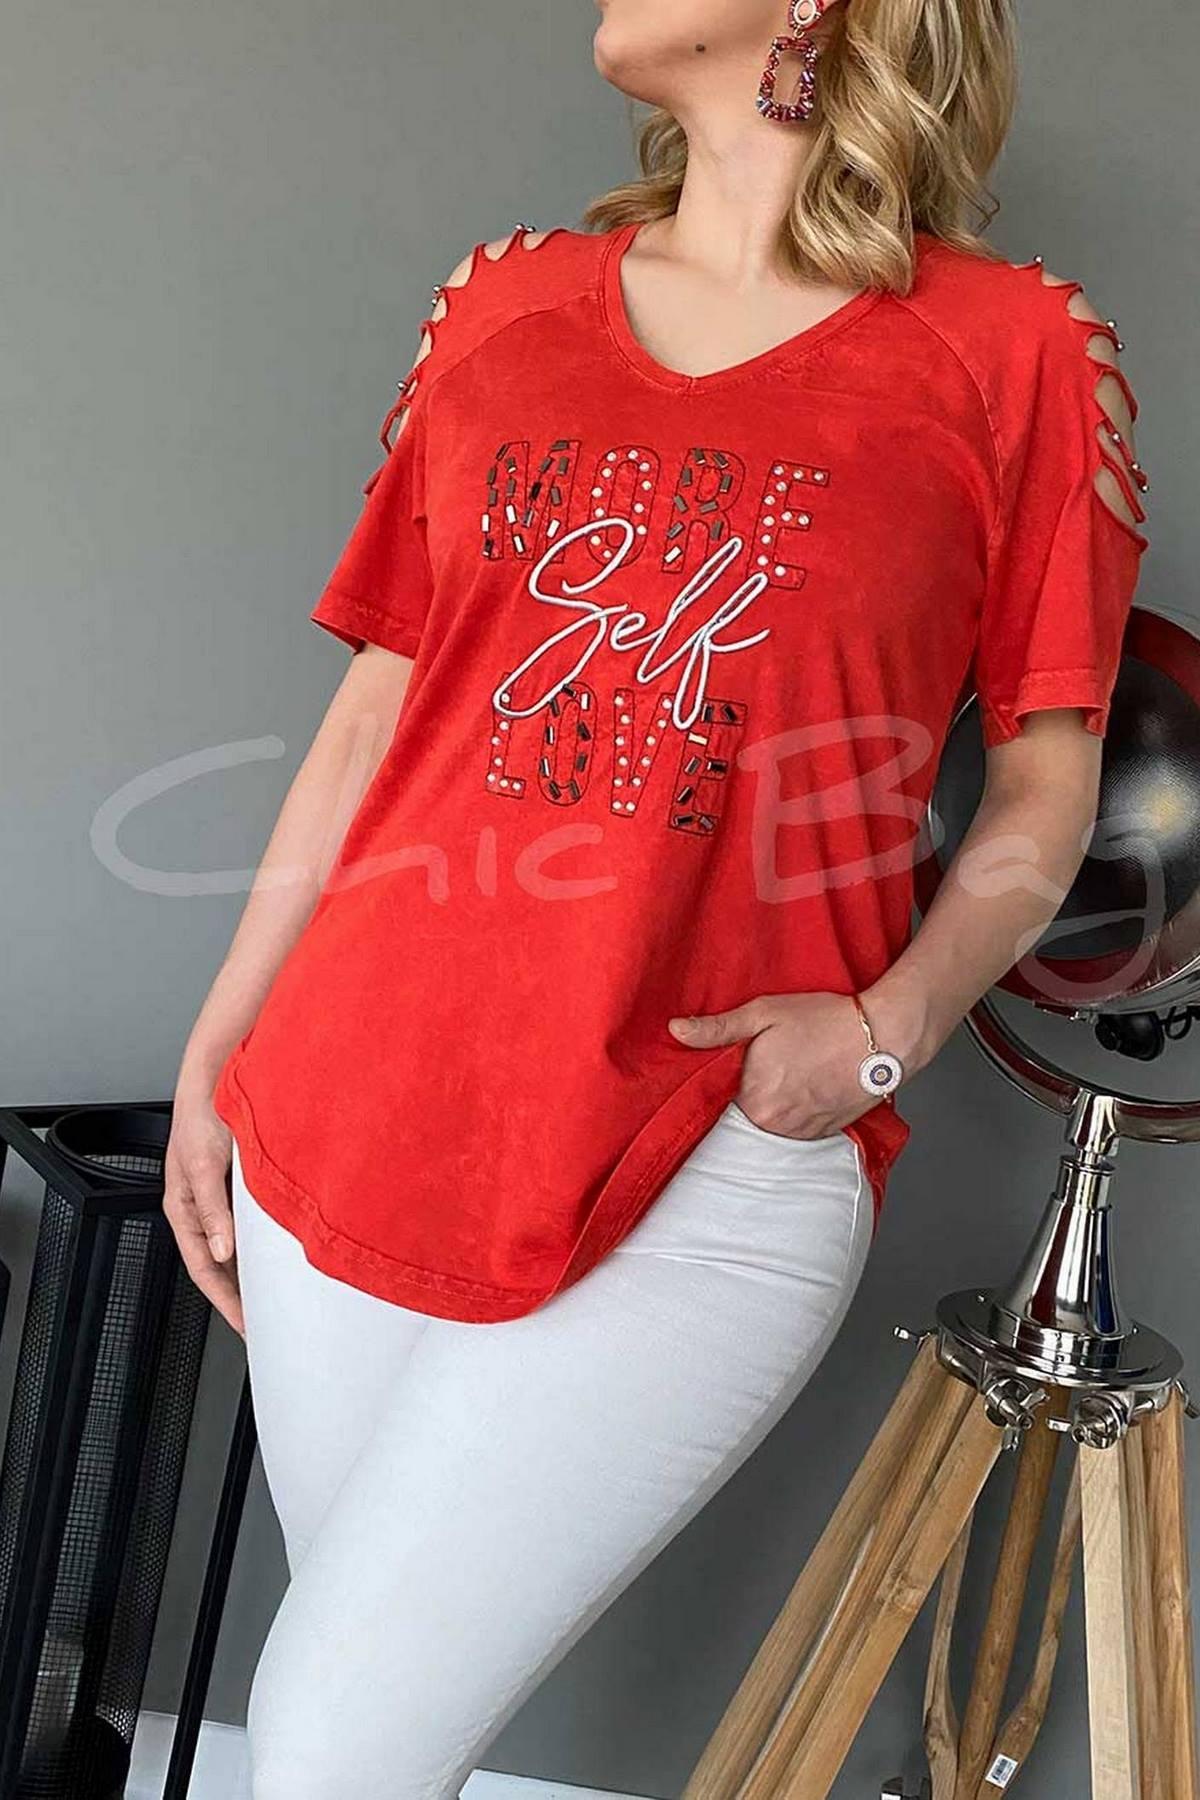 https://resim.chicbag.com.tr/p000816/krz/more-self-love-baski-omuz-kesik-dekolteli-v-yaka-t-shirt-swns-01e08247a0ee.